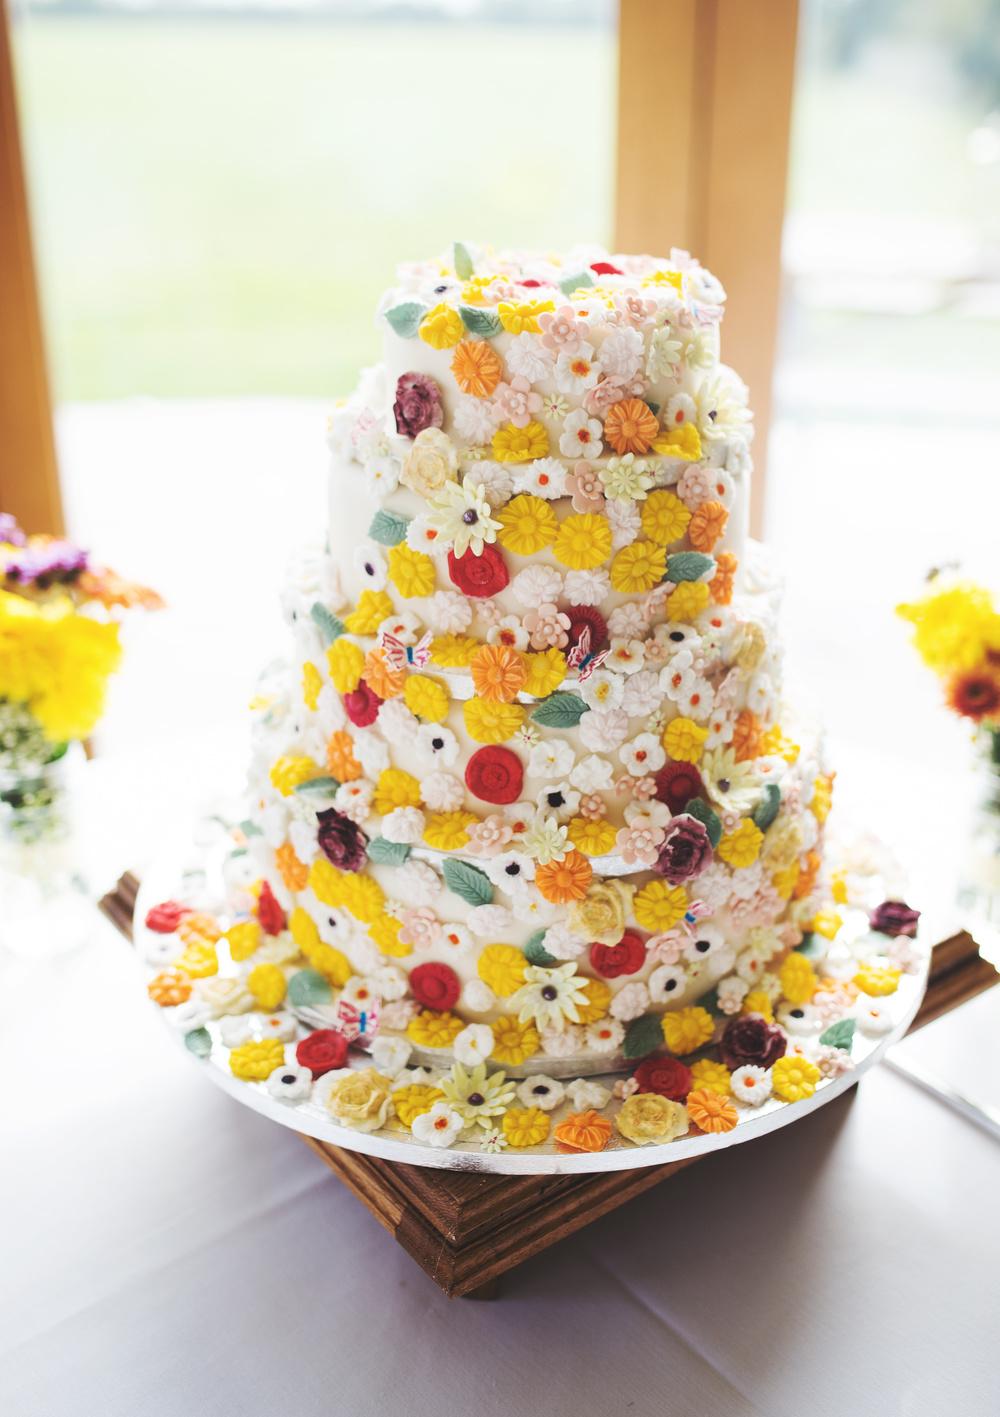 The wedding cake- Rustic themed wedding